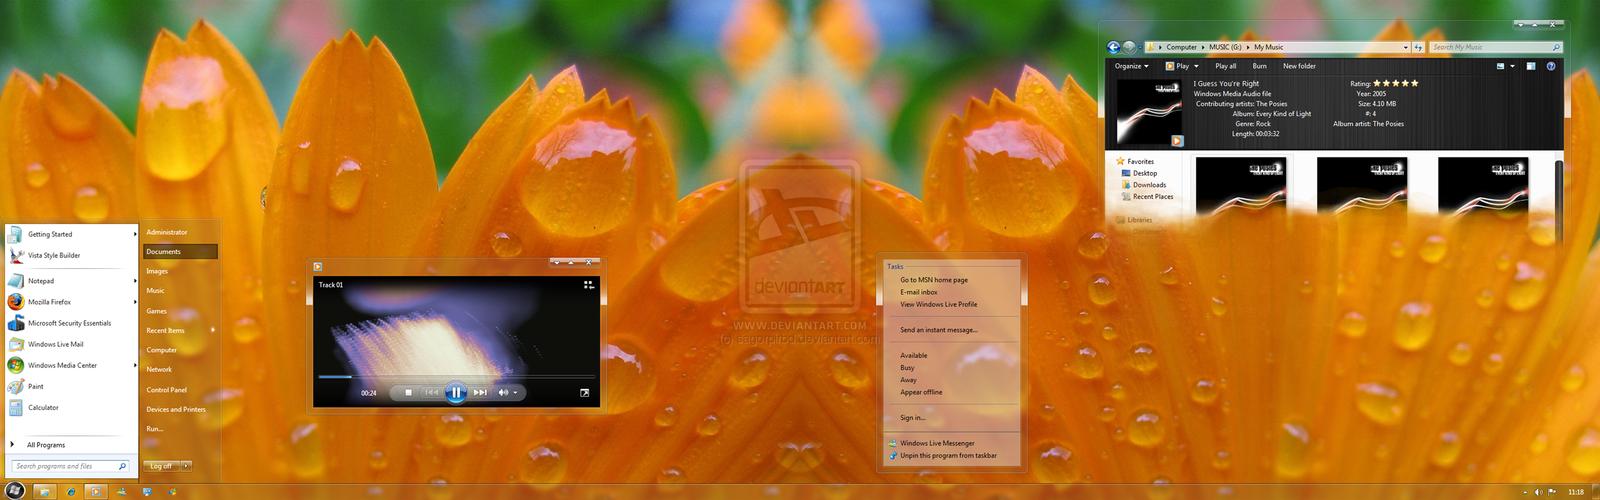 Satin2 7 Plus Port to Windows 7 by sagorpirbd